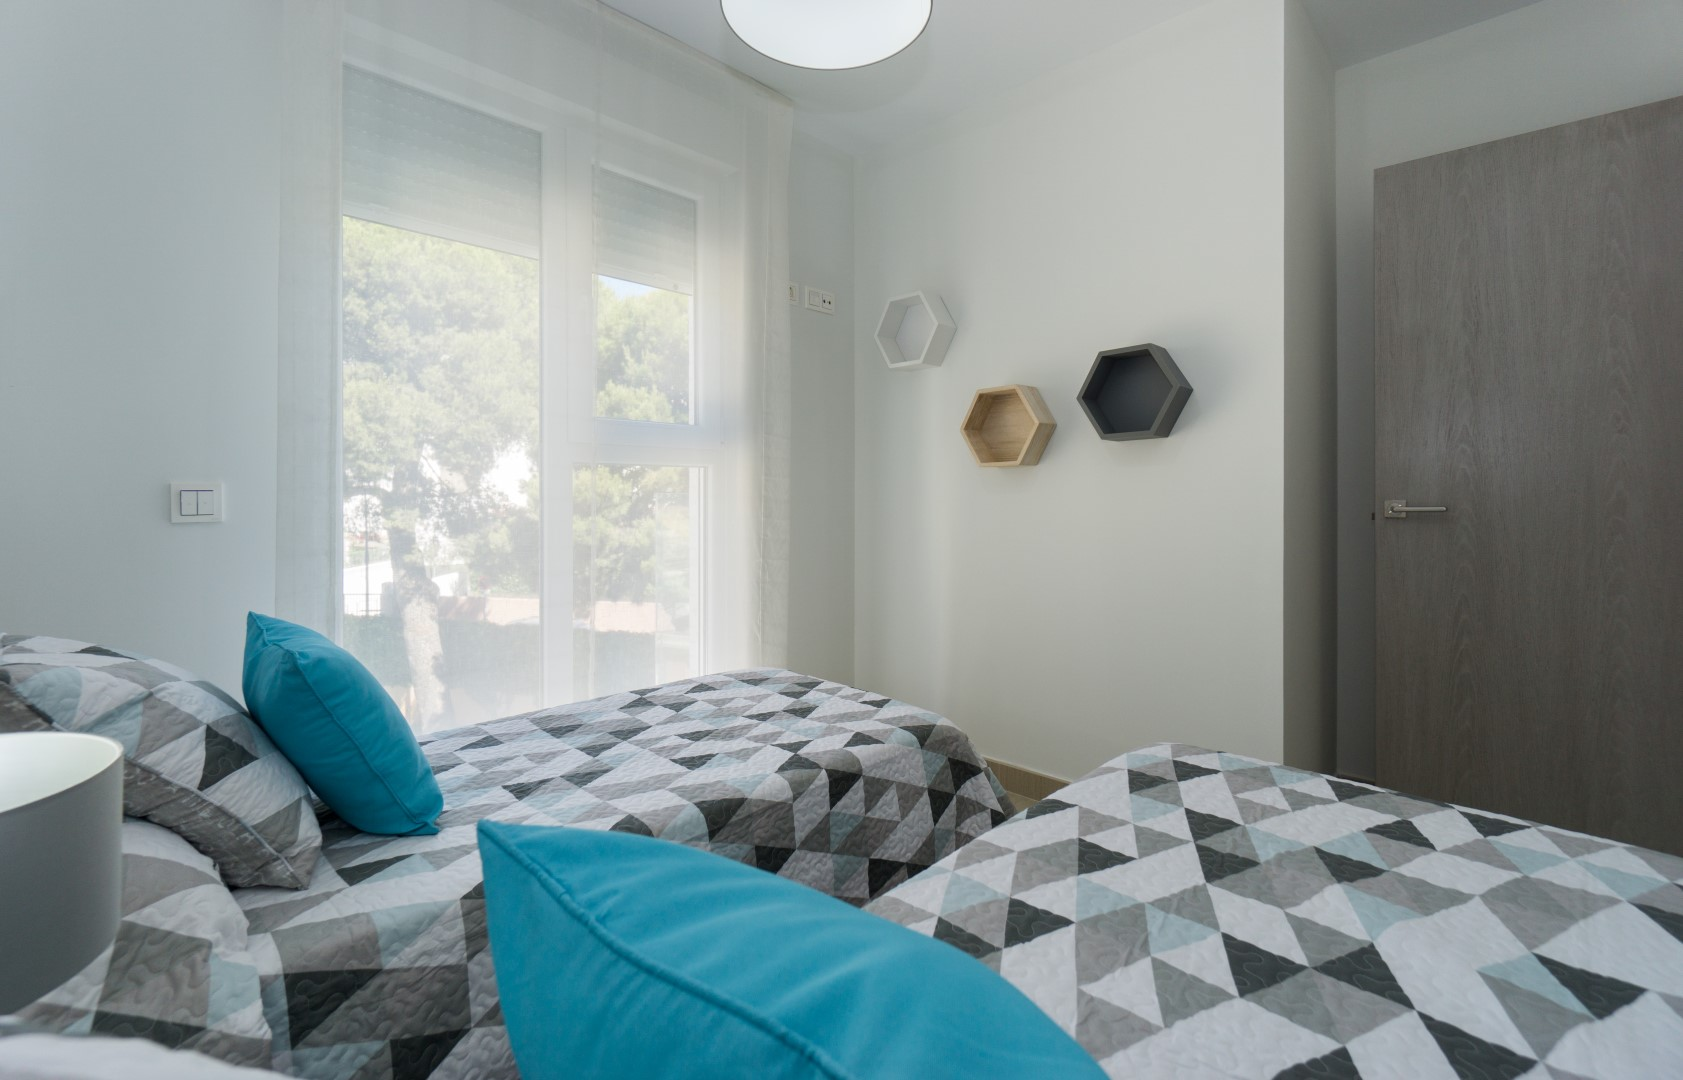 Apartment in Benalmadena MA3142741 16